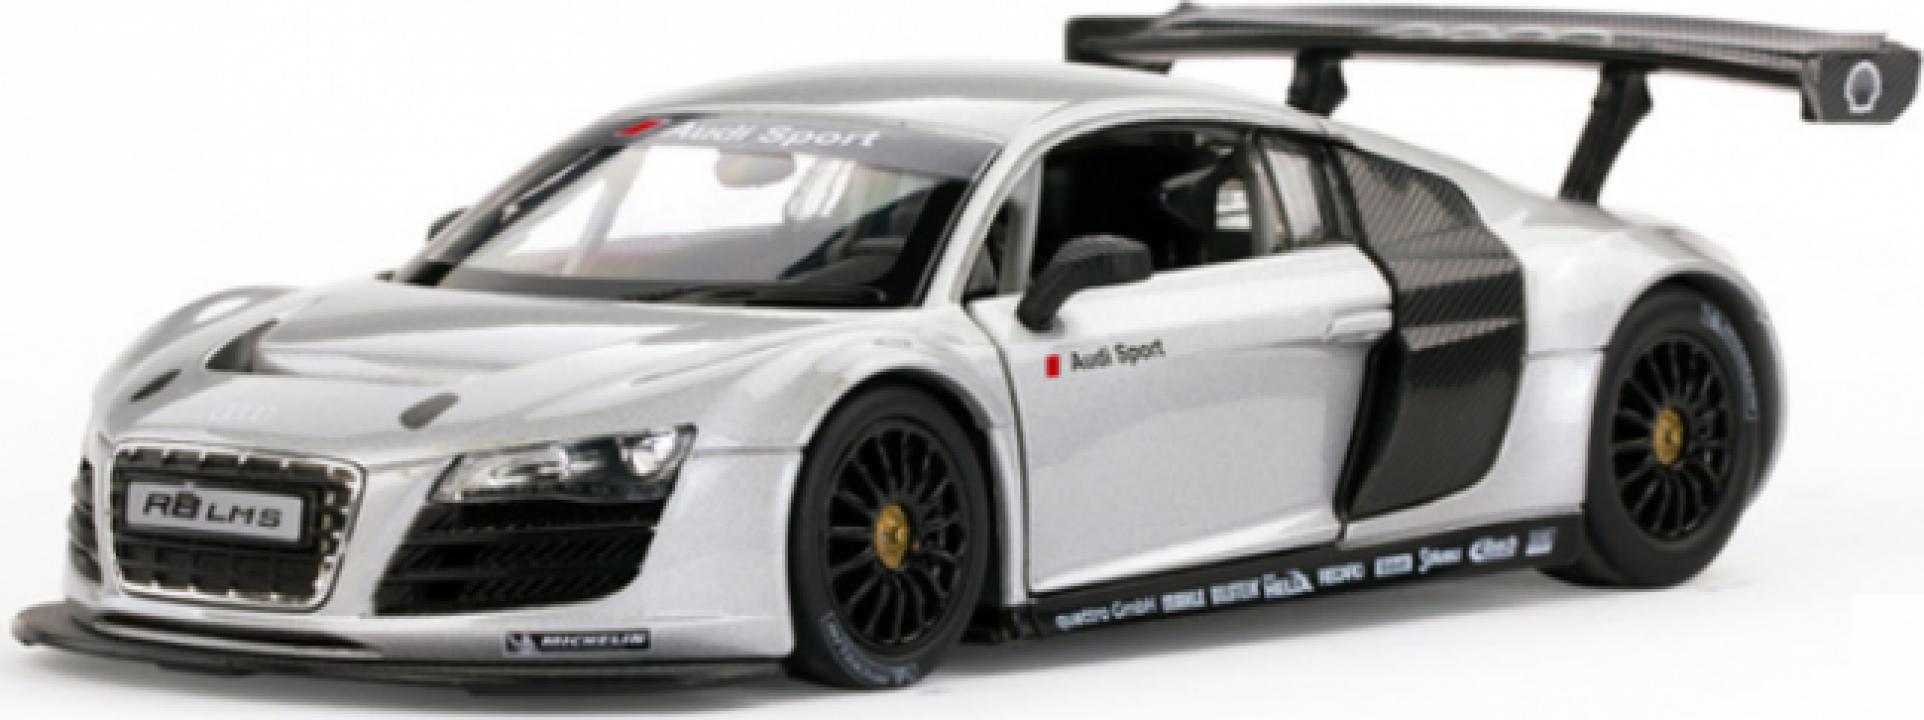 Macheta Masina Rastar, Audi R8 1:14 RTR cu telecomanda - alb